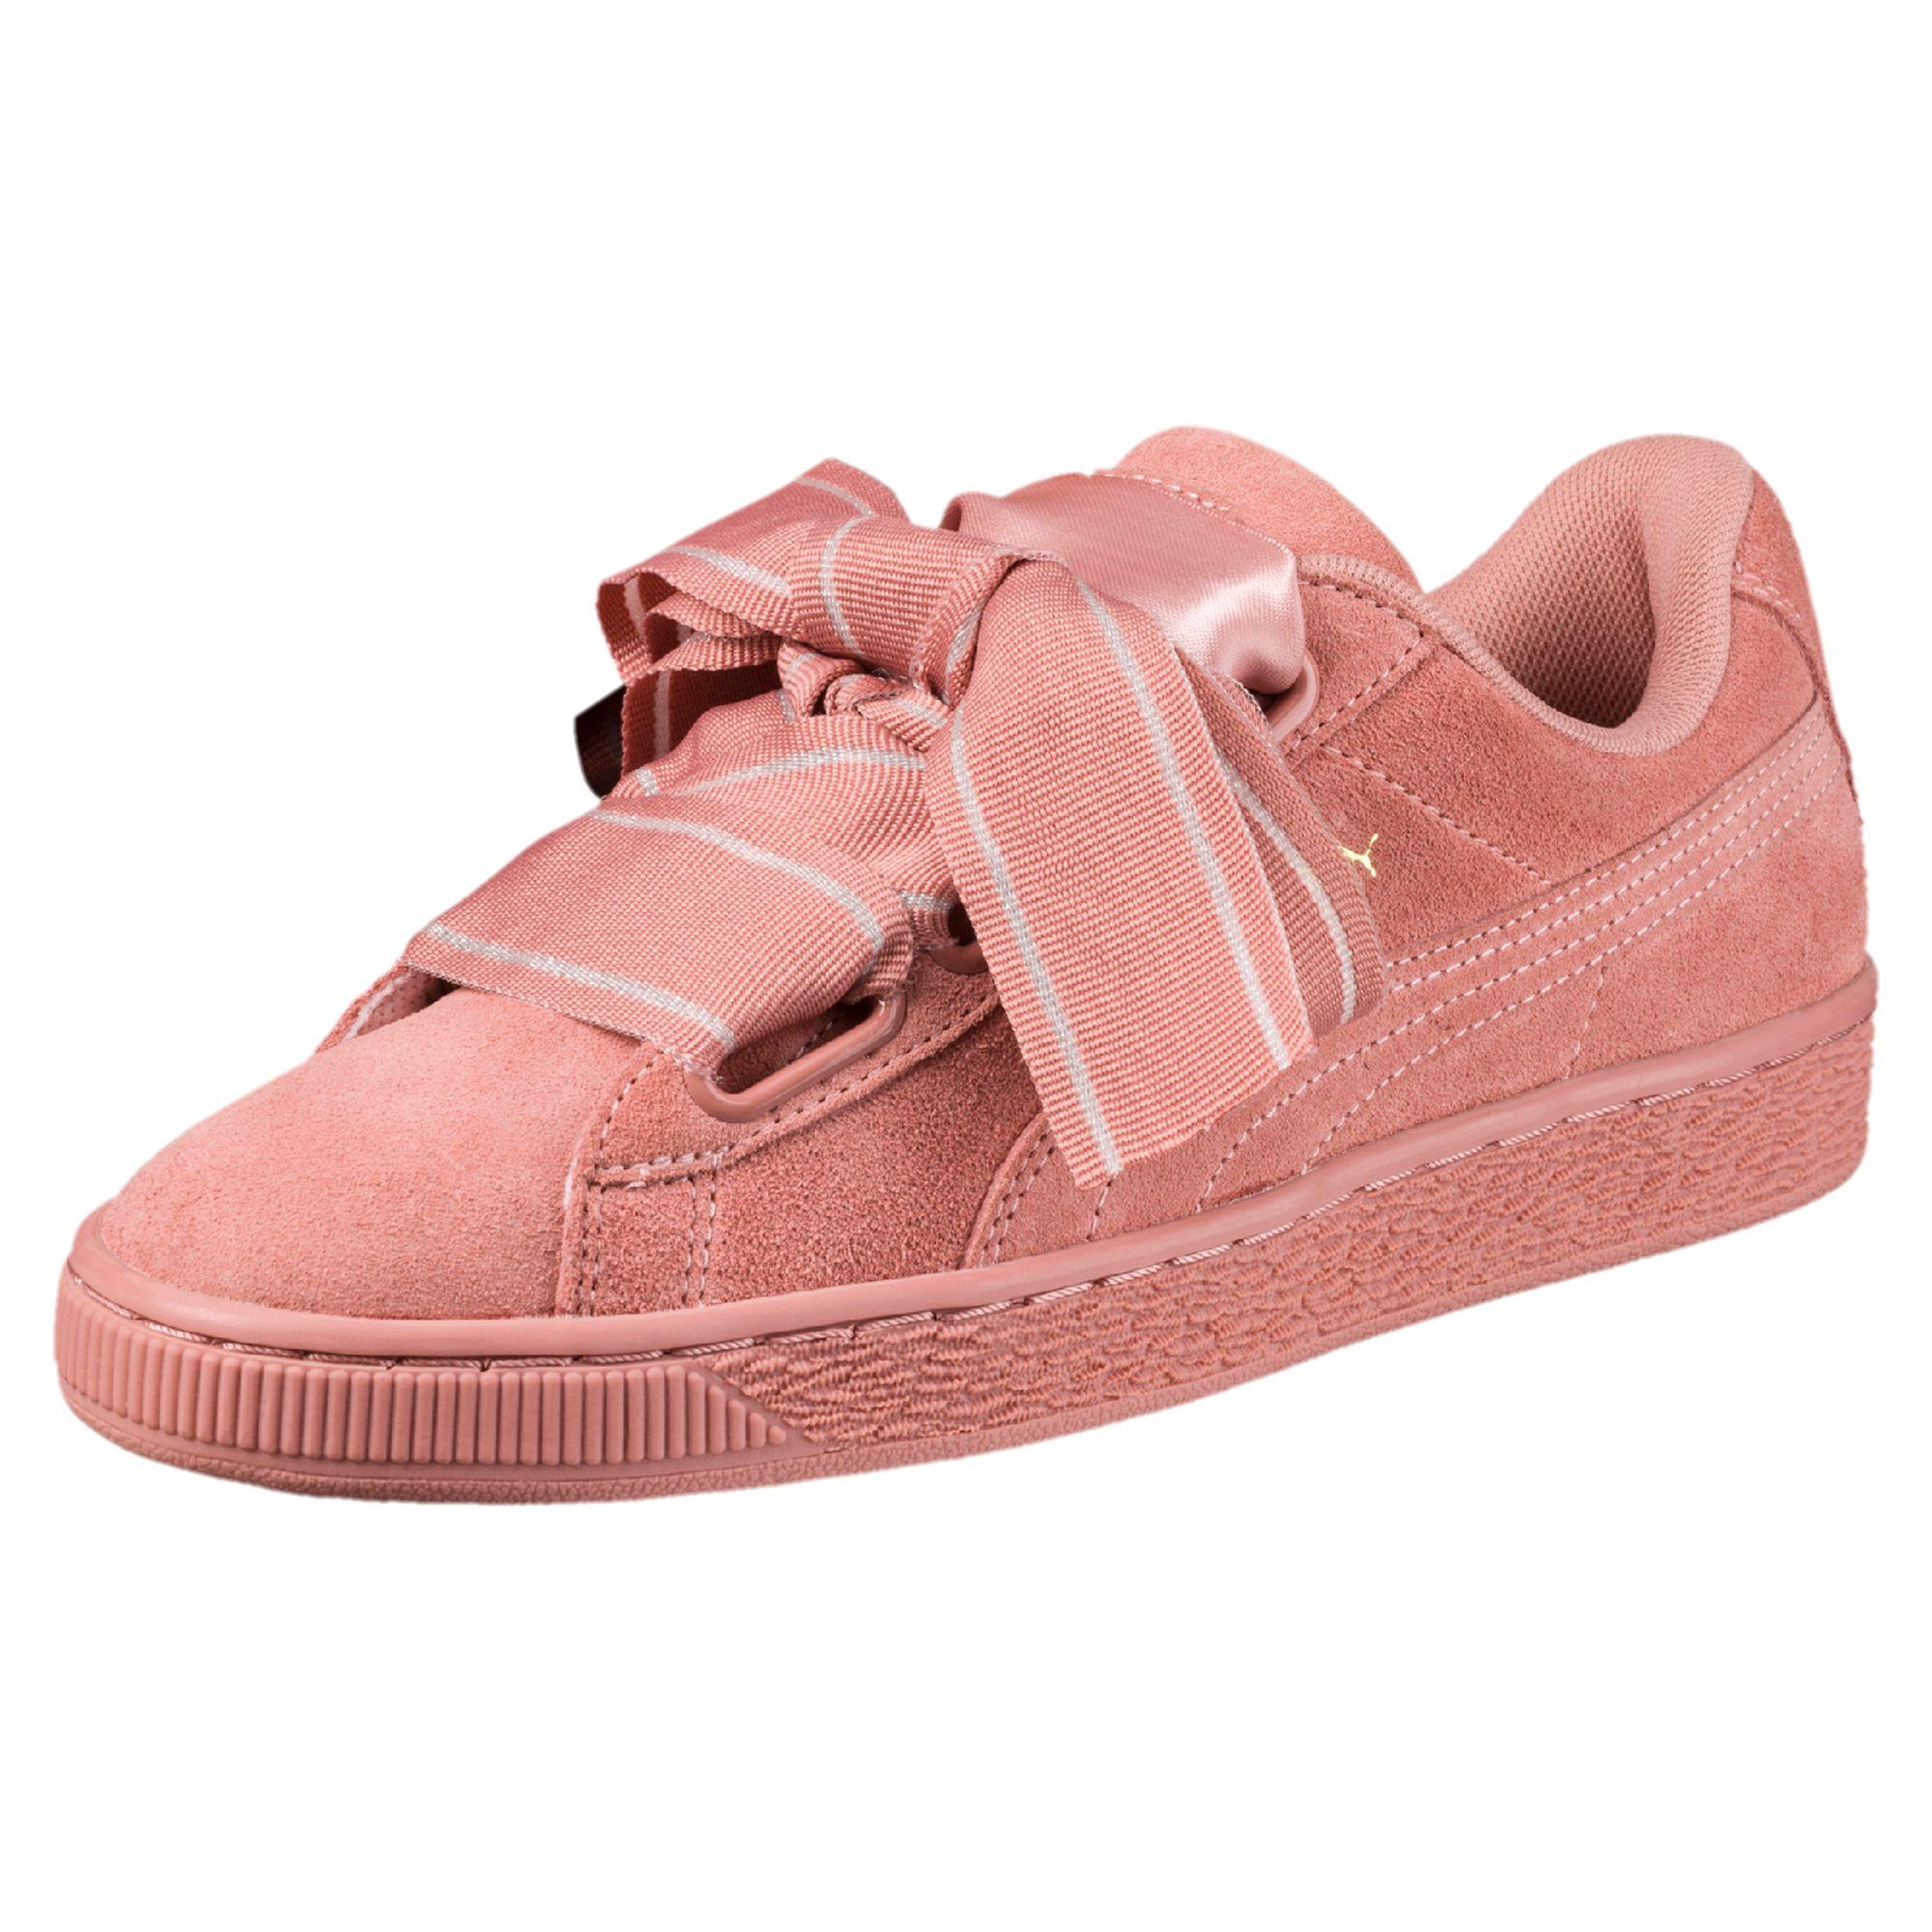 Suede Satin Heart II женские кроссовки